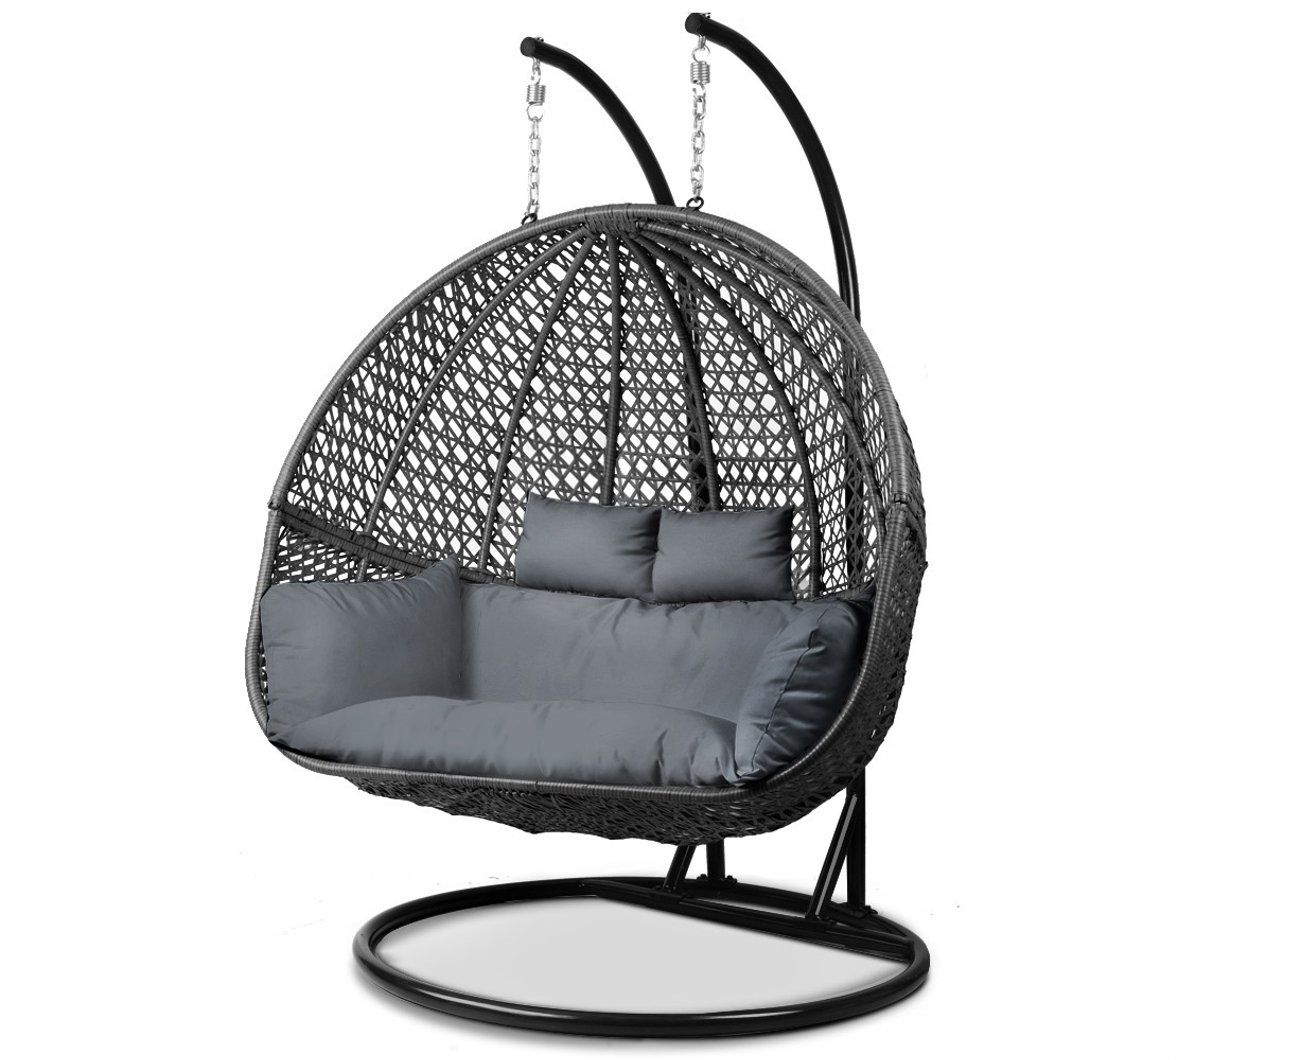 Gardeon stylish outdoor furniture wicker hanging swing egg